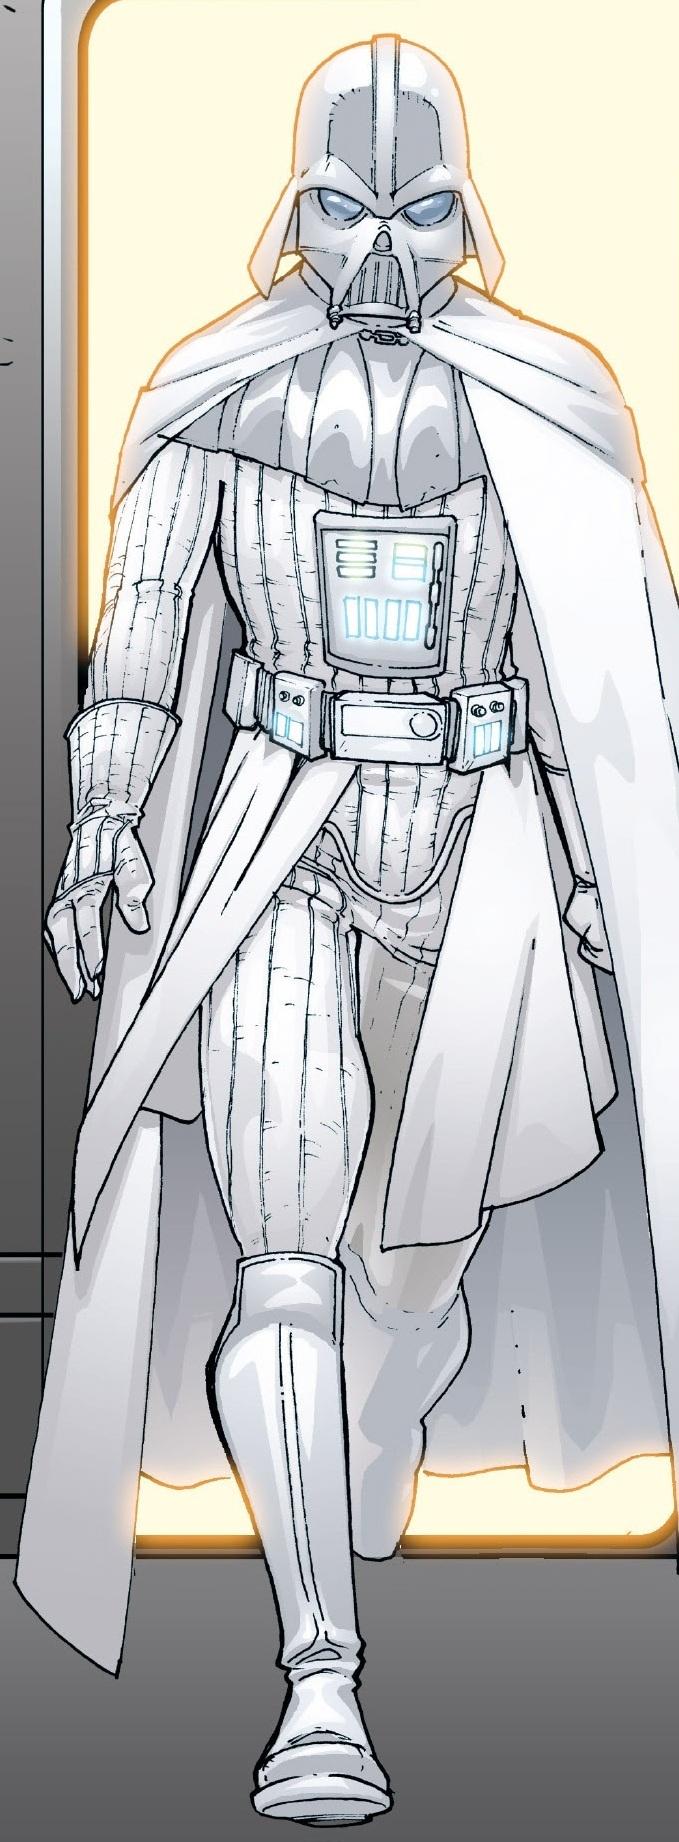 environ 15.24 cm DC Comics Multi-Univers Justice Ligue Film Cyborg Action Figure 6 in